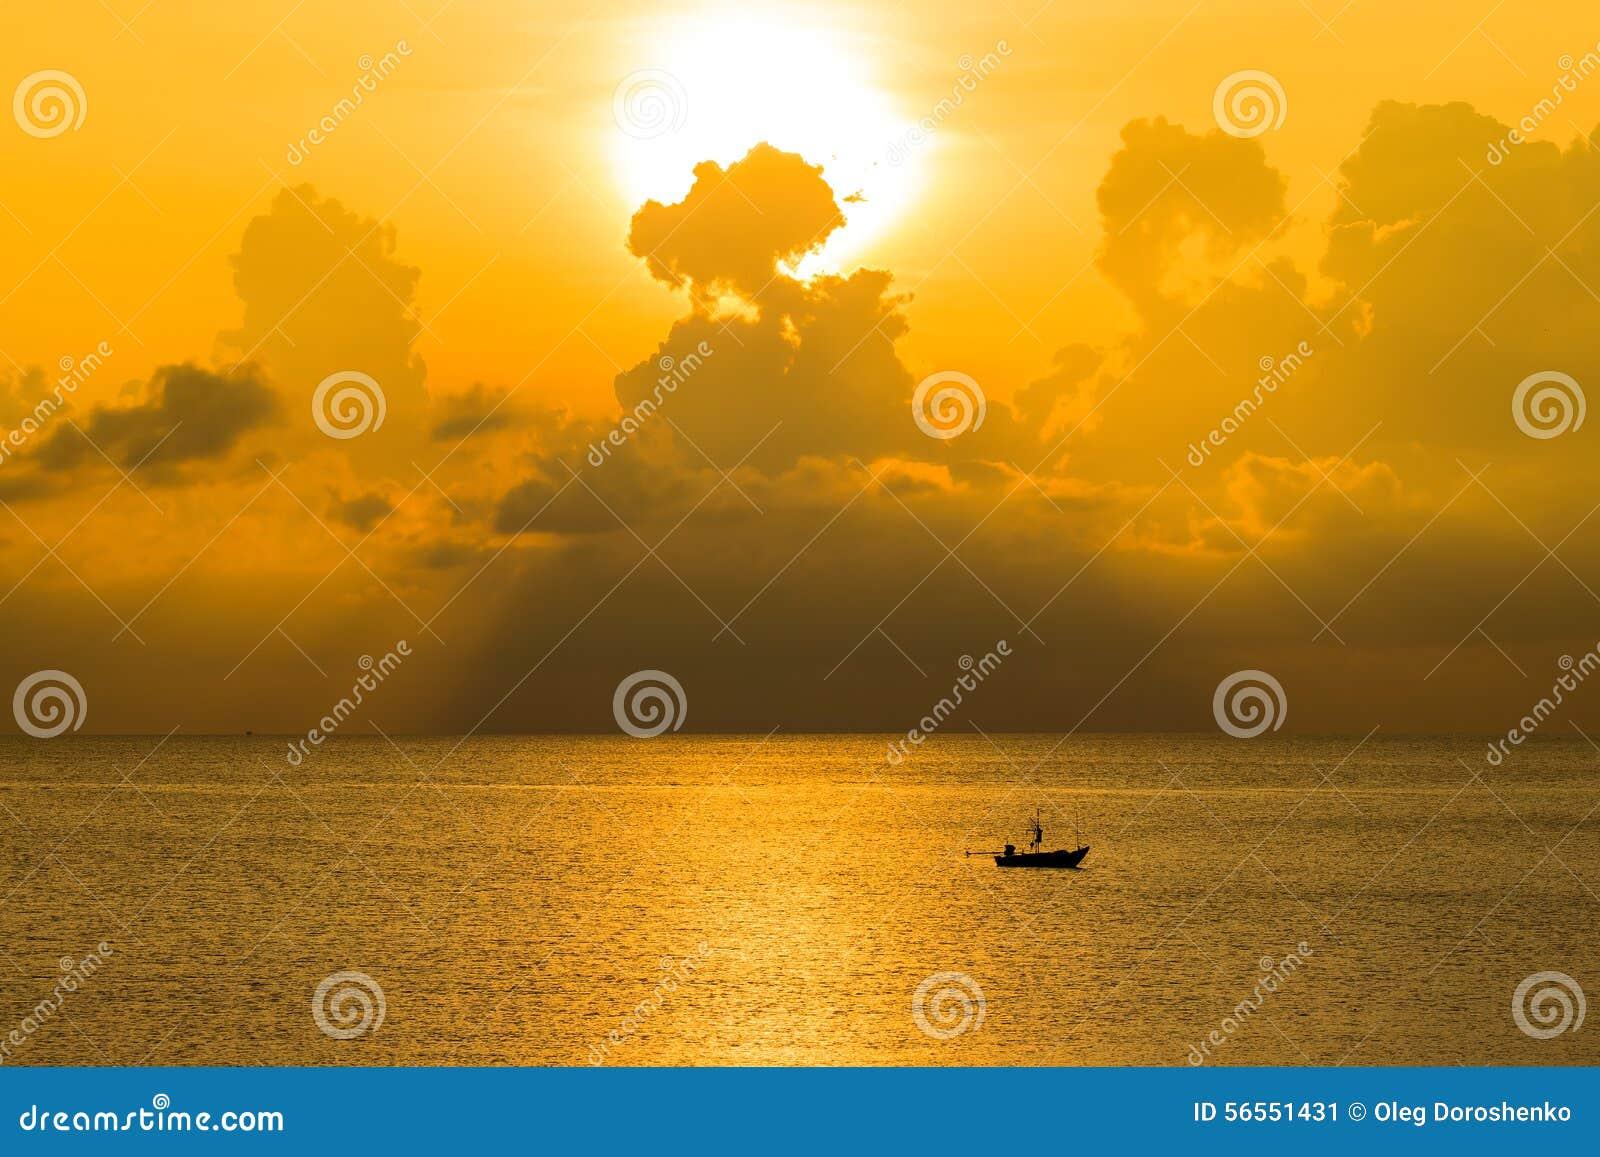 Download Όμορφη ανατολή στην παραλία στην Ταϊλάνδη Στοκ Εικόνα - εικόνα από φως, βουτήξτε: 56551431